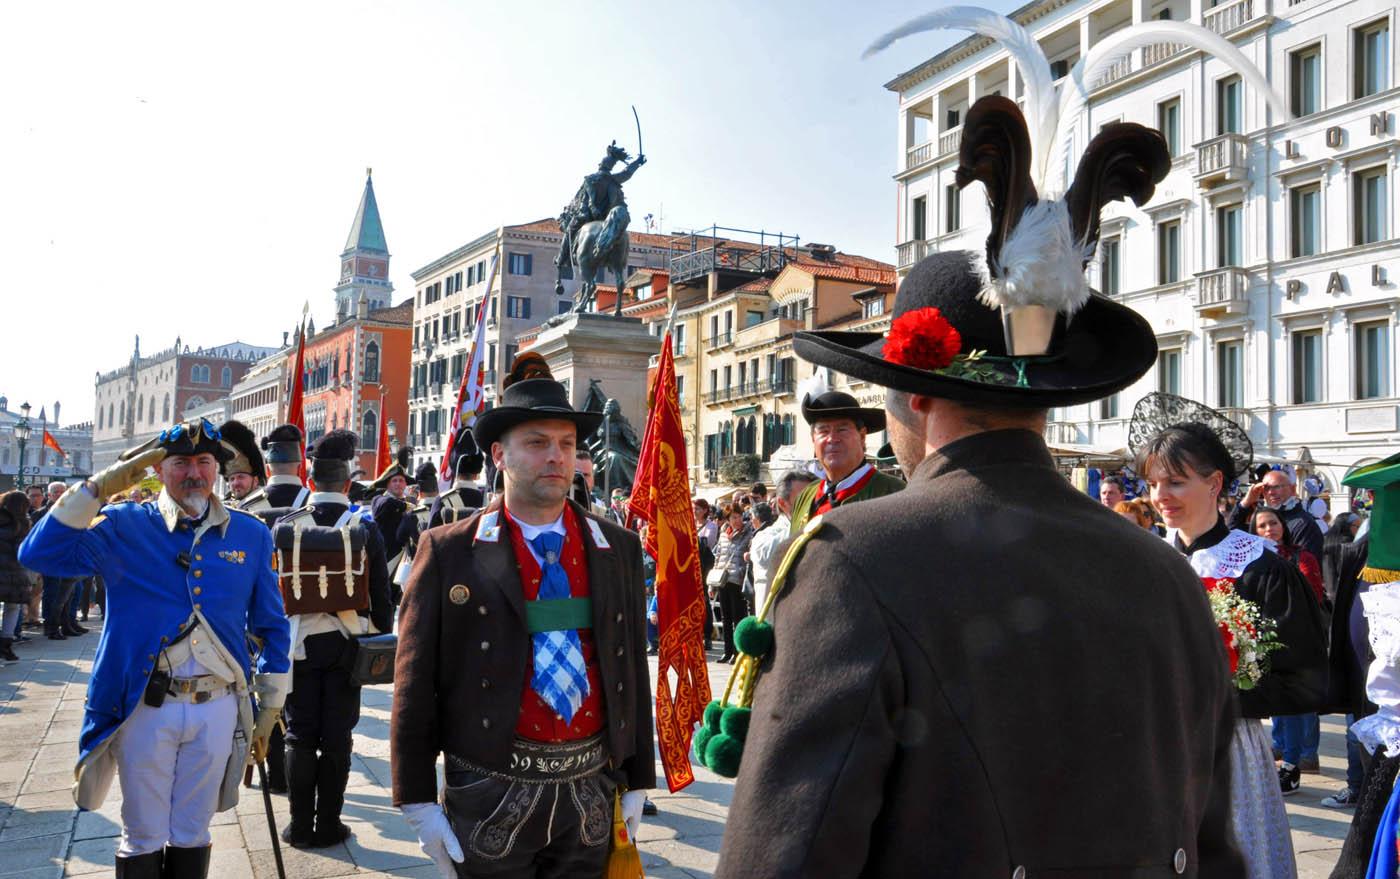 Tiroler Schützen am Grab des Heiligen Markus in Venedig